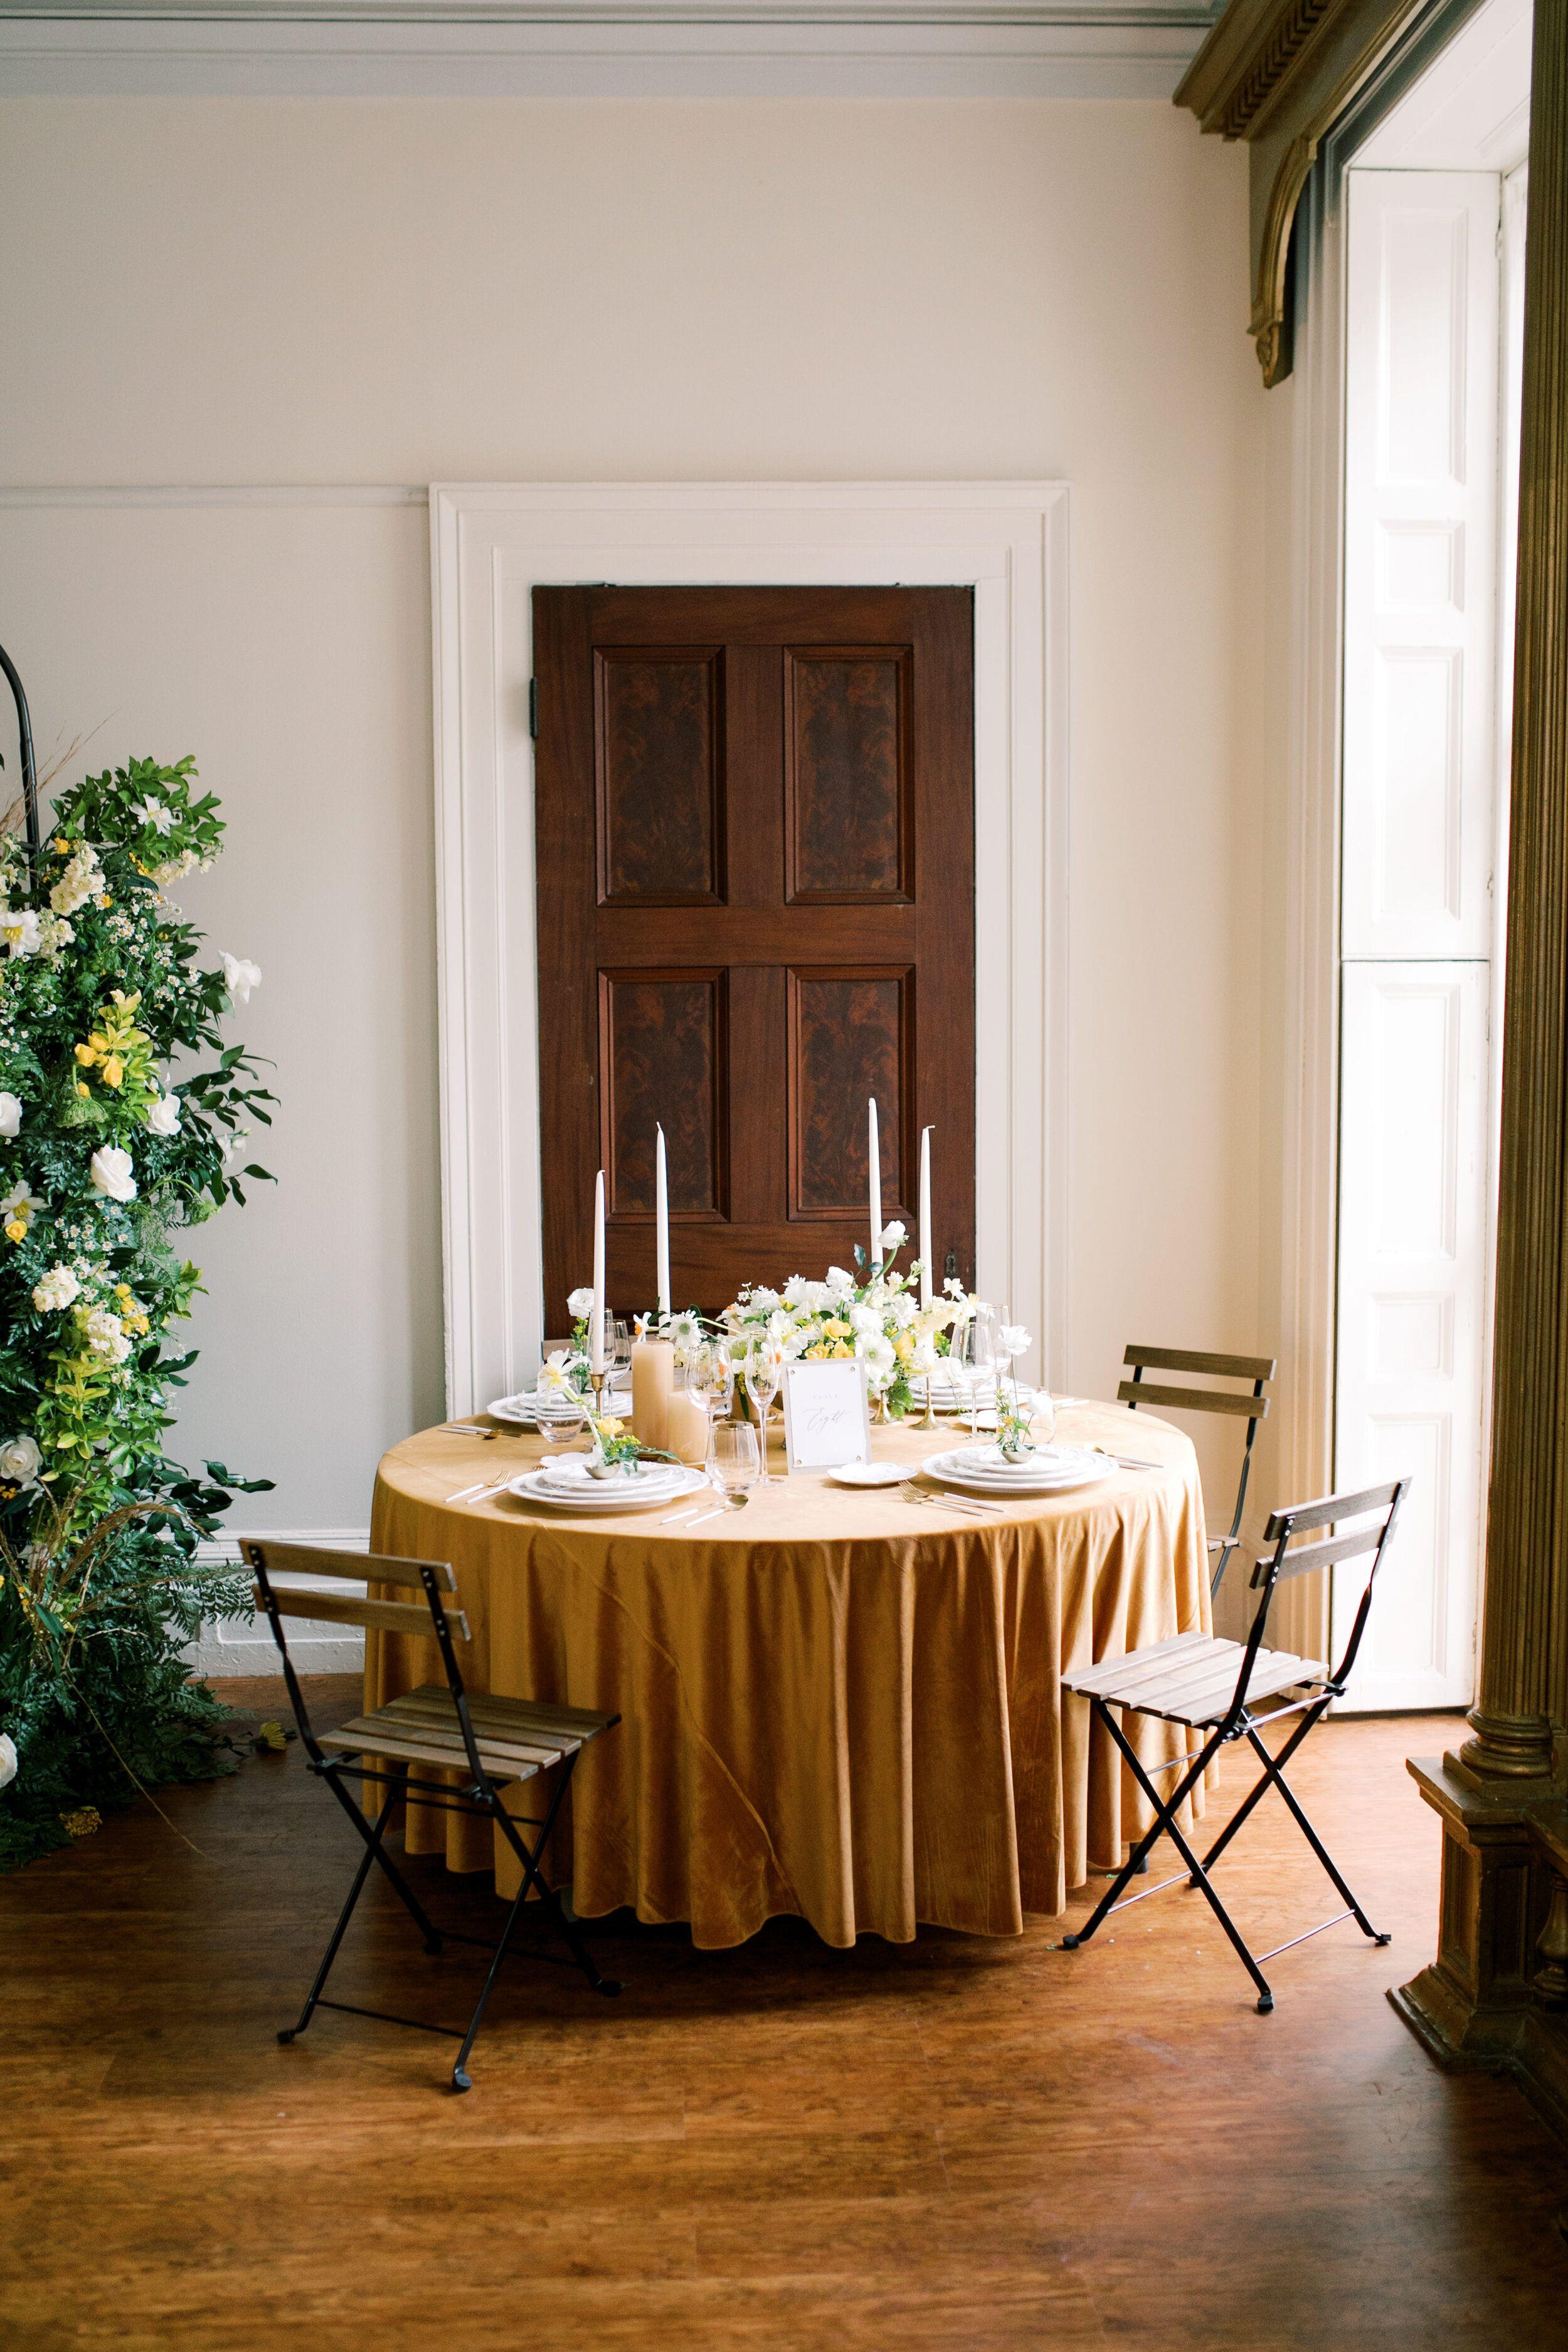 Romantic Mansion Wedding Inspiration in Tones of Yellow